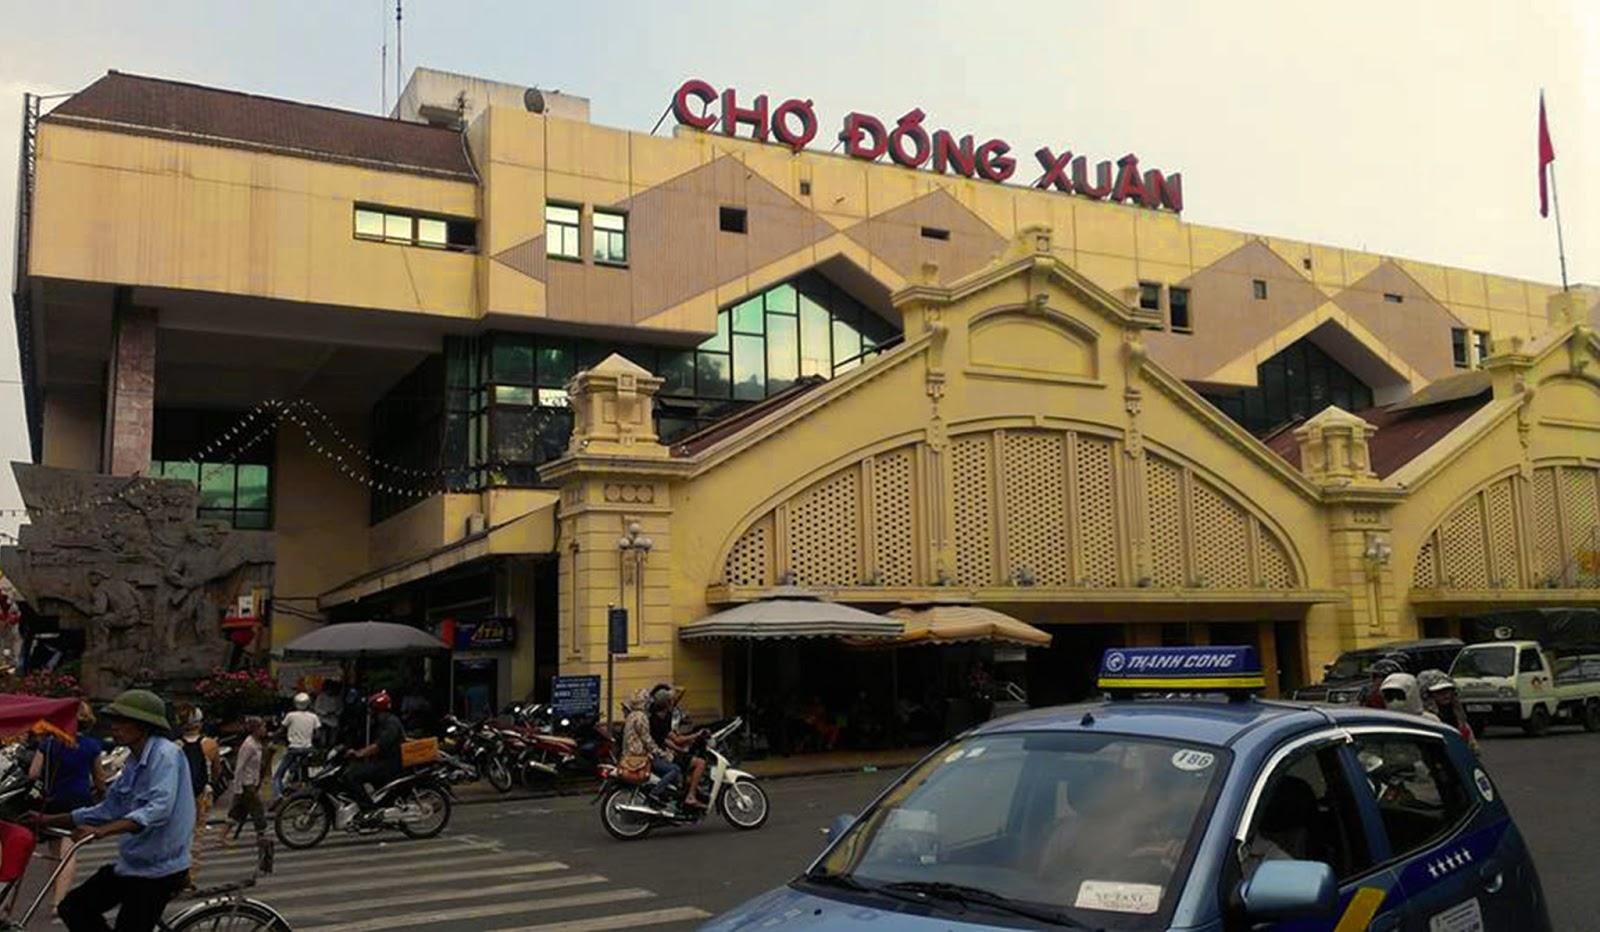 Dong Xuan Market in Hanoi